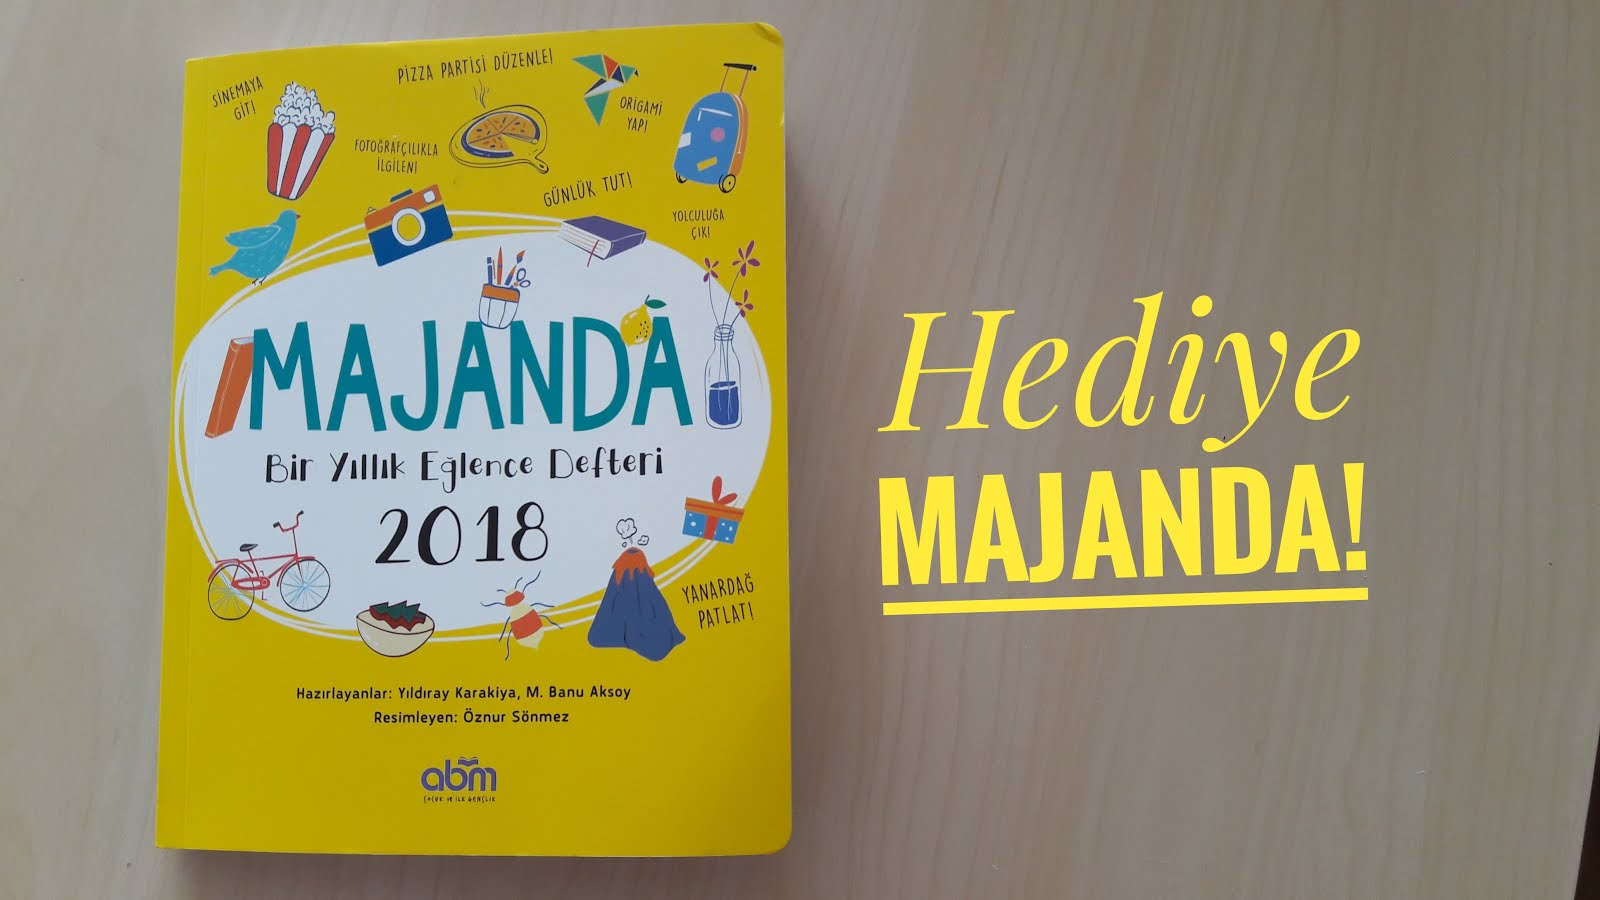 Hediye Majanda